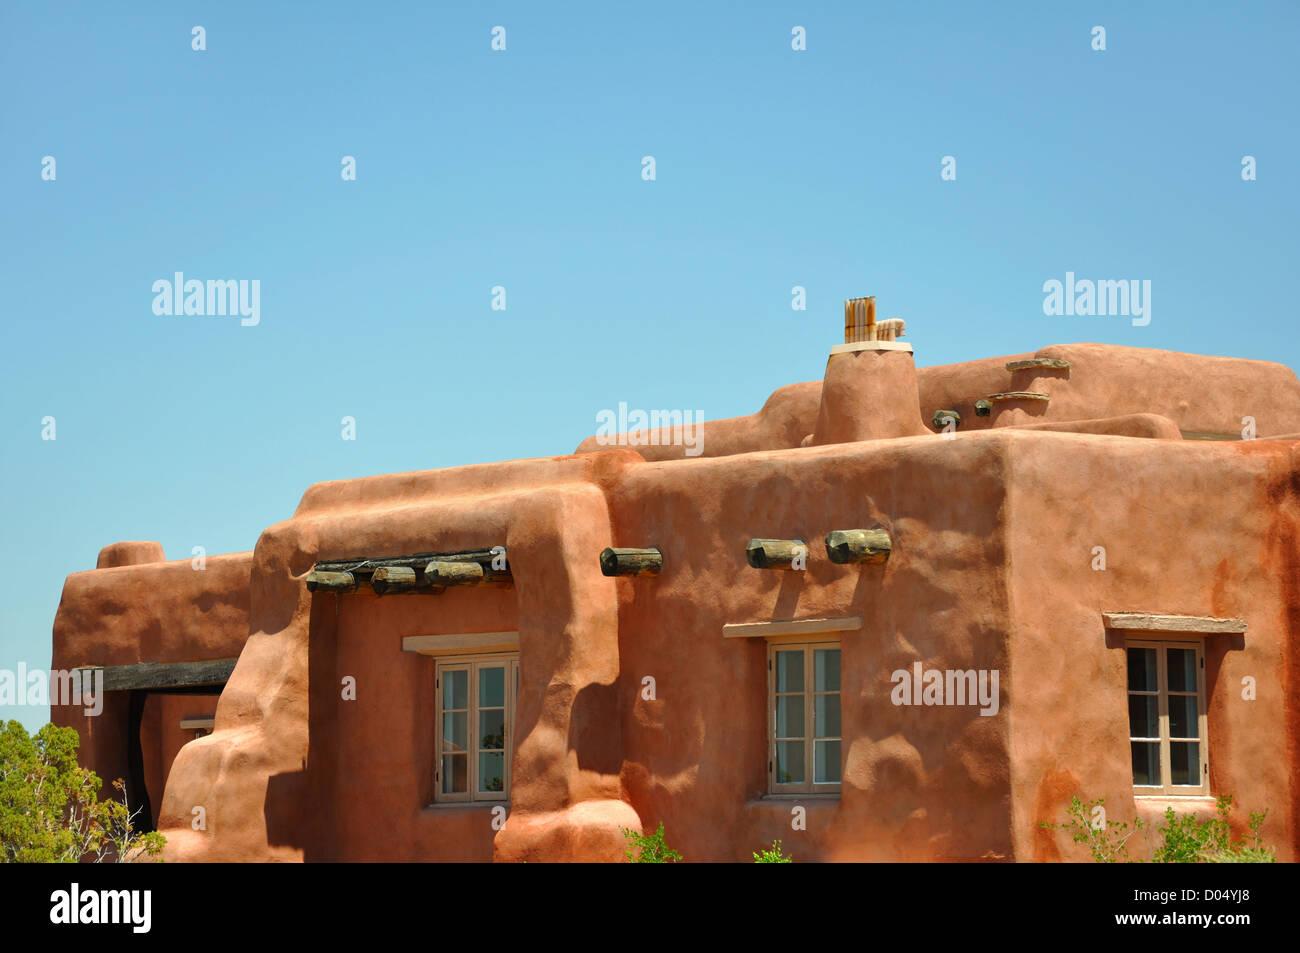 Stile Adobe House, Arizona, Stati Uniti d'America Immagini Stock